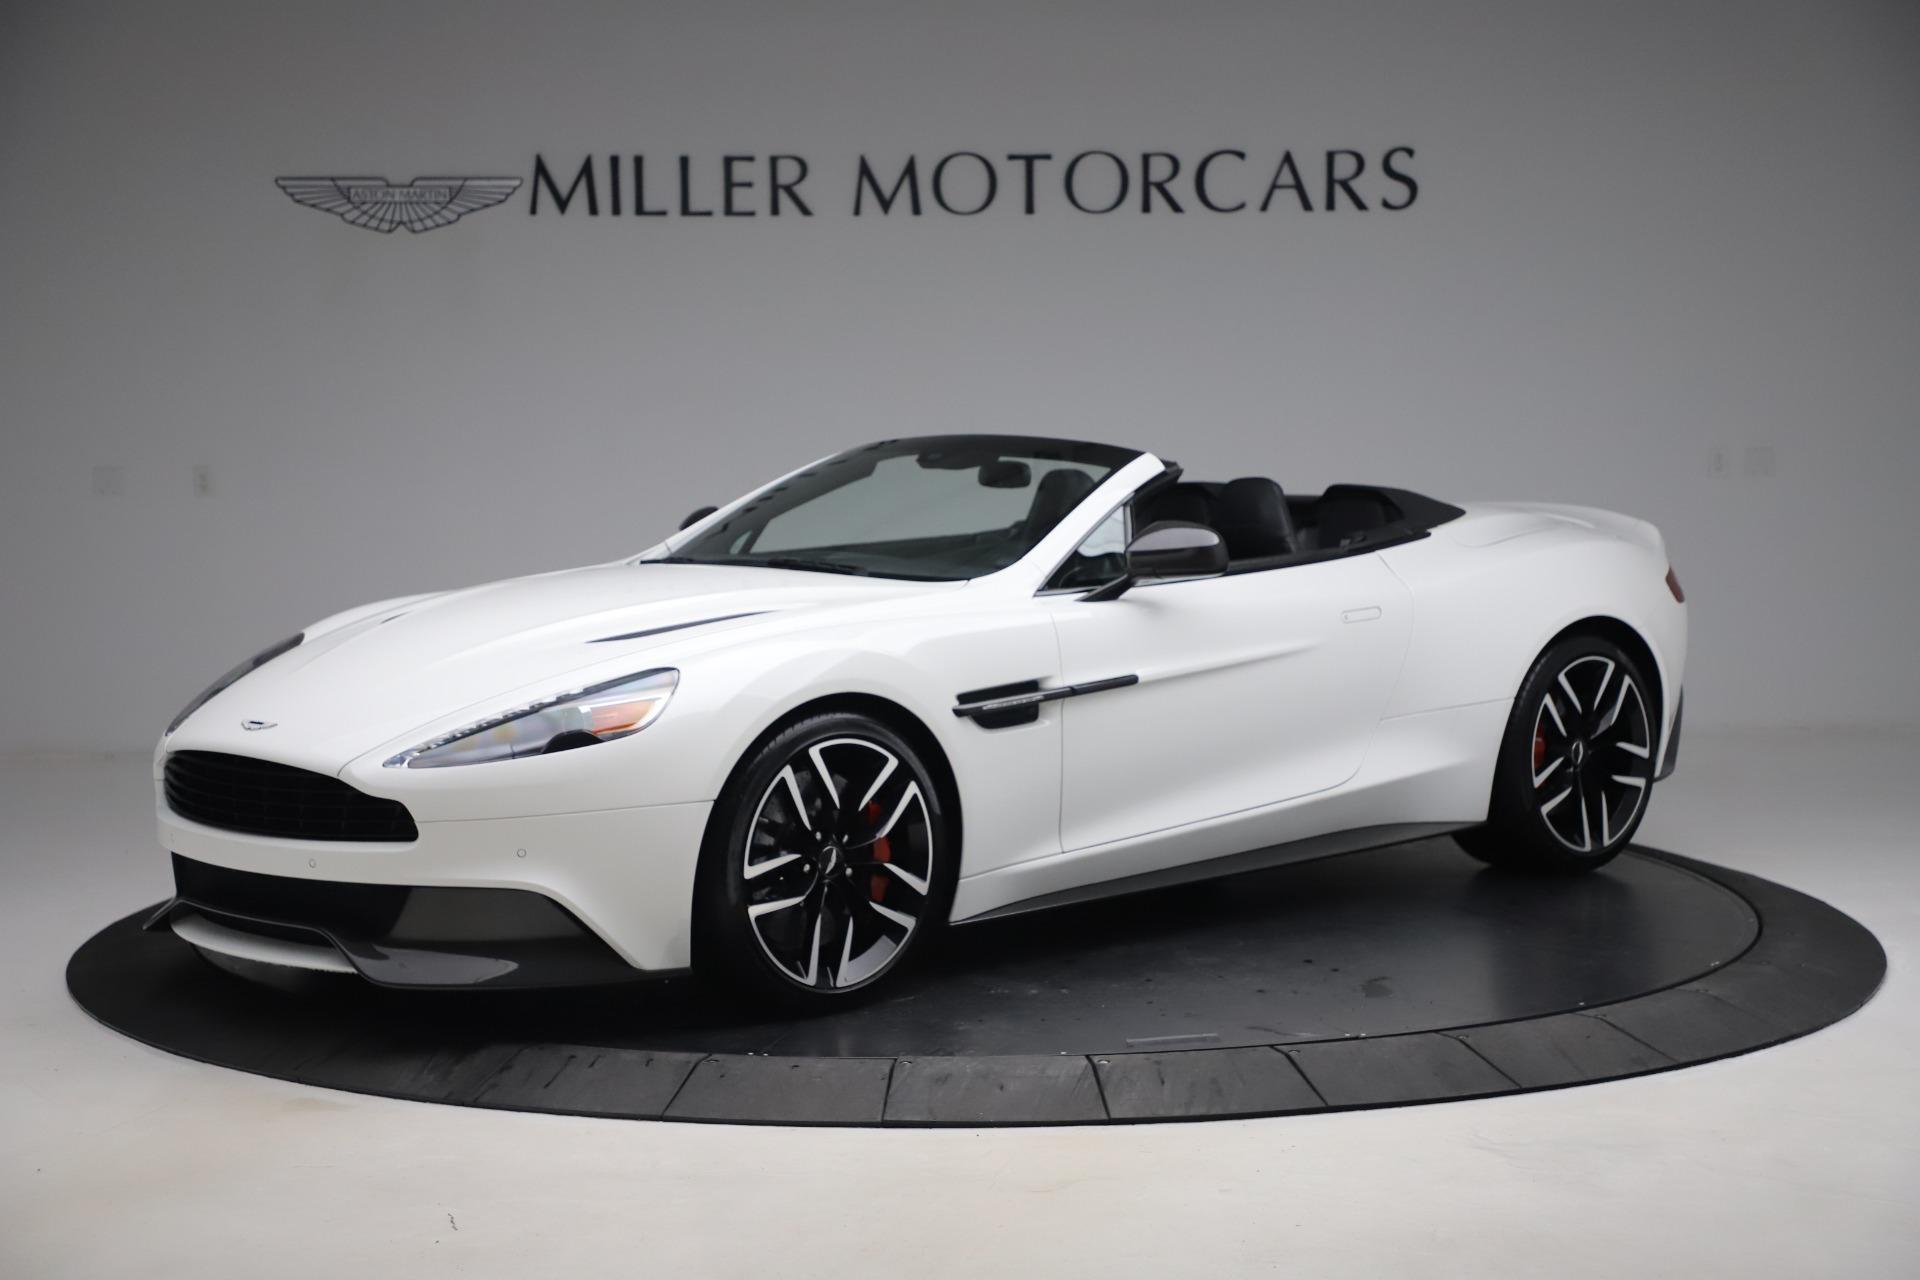 Used 2015 Aston Martin Vanquish Volante for sale $139,900 at Maserati of Greenwich in Greenwich CT 06830 1